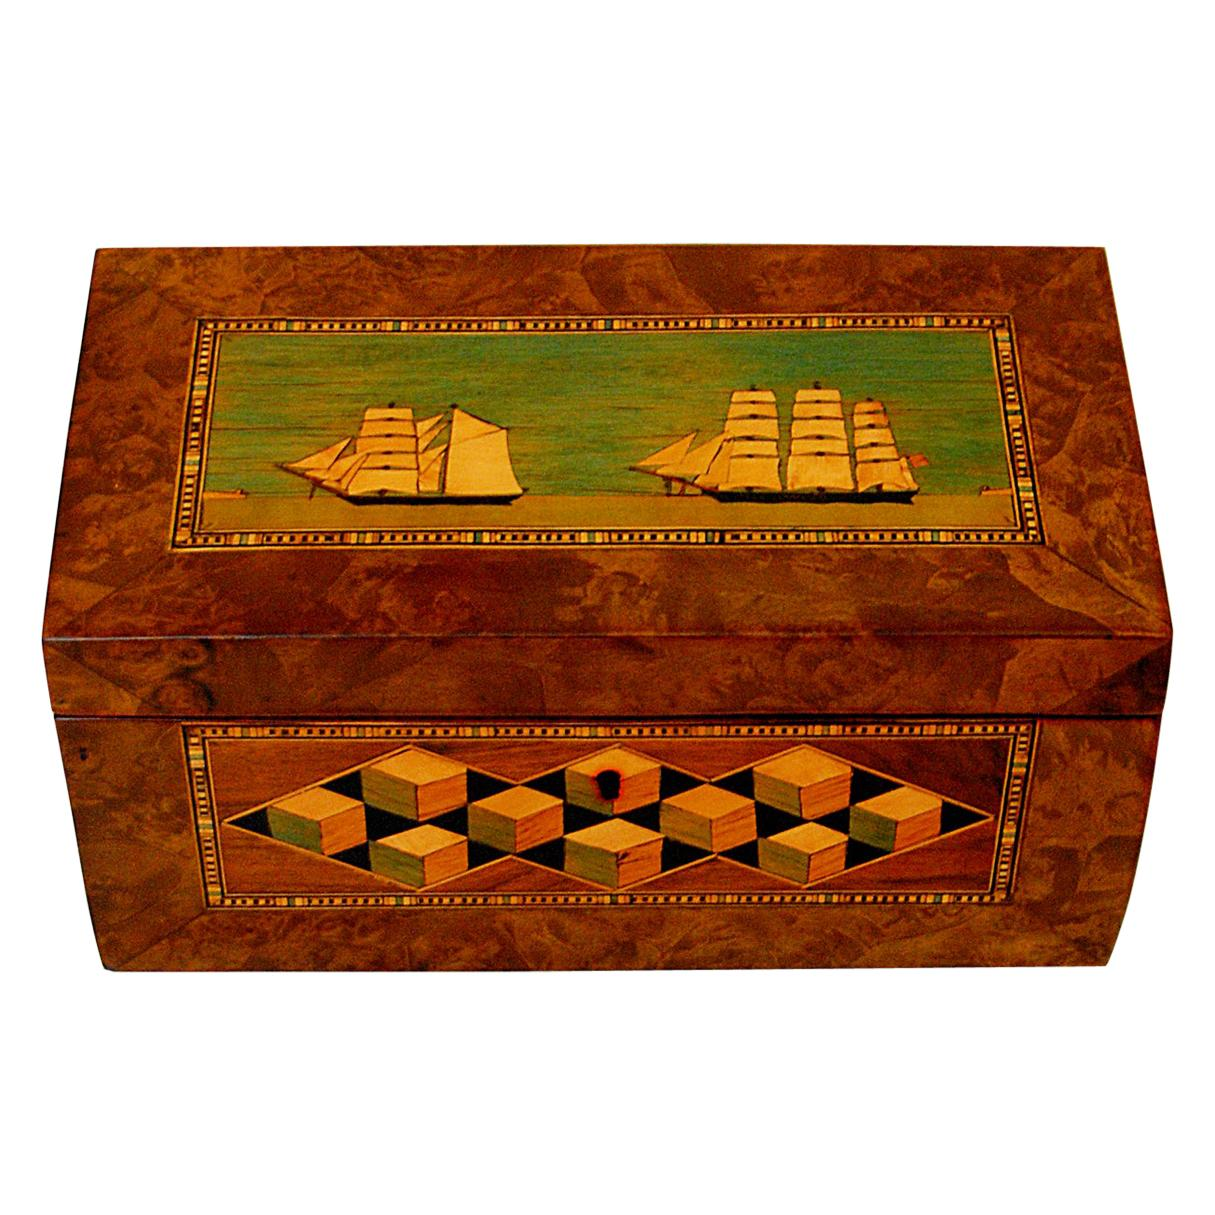 English 19th Century Trinity House Tea Caddy Ship and Perspective Cube Inlay